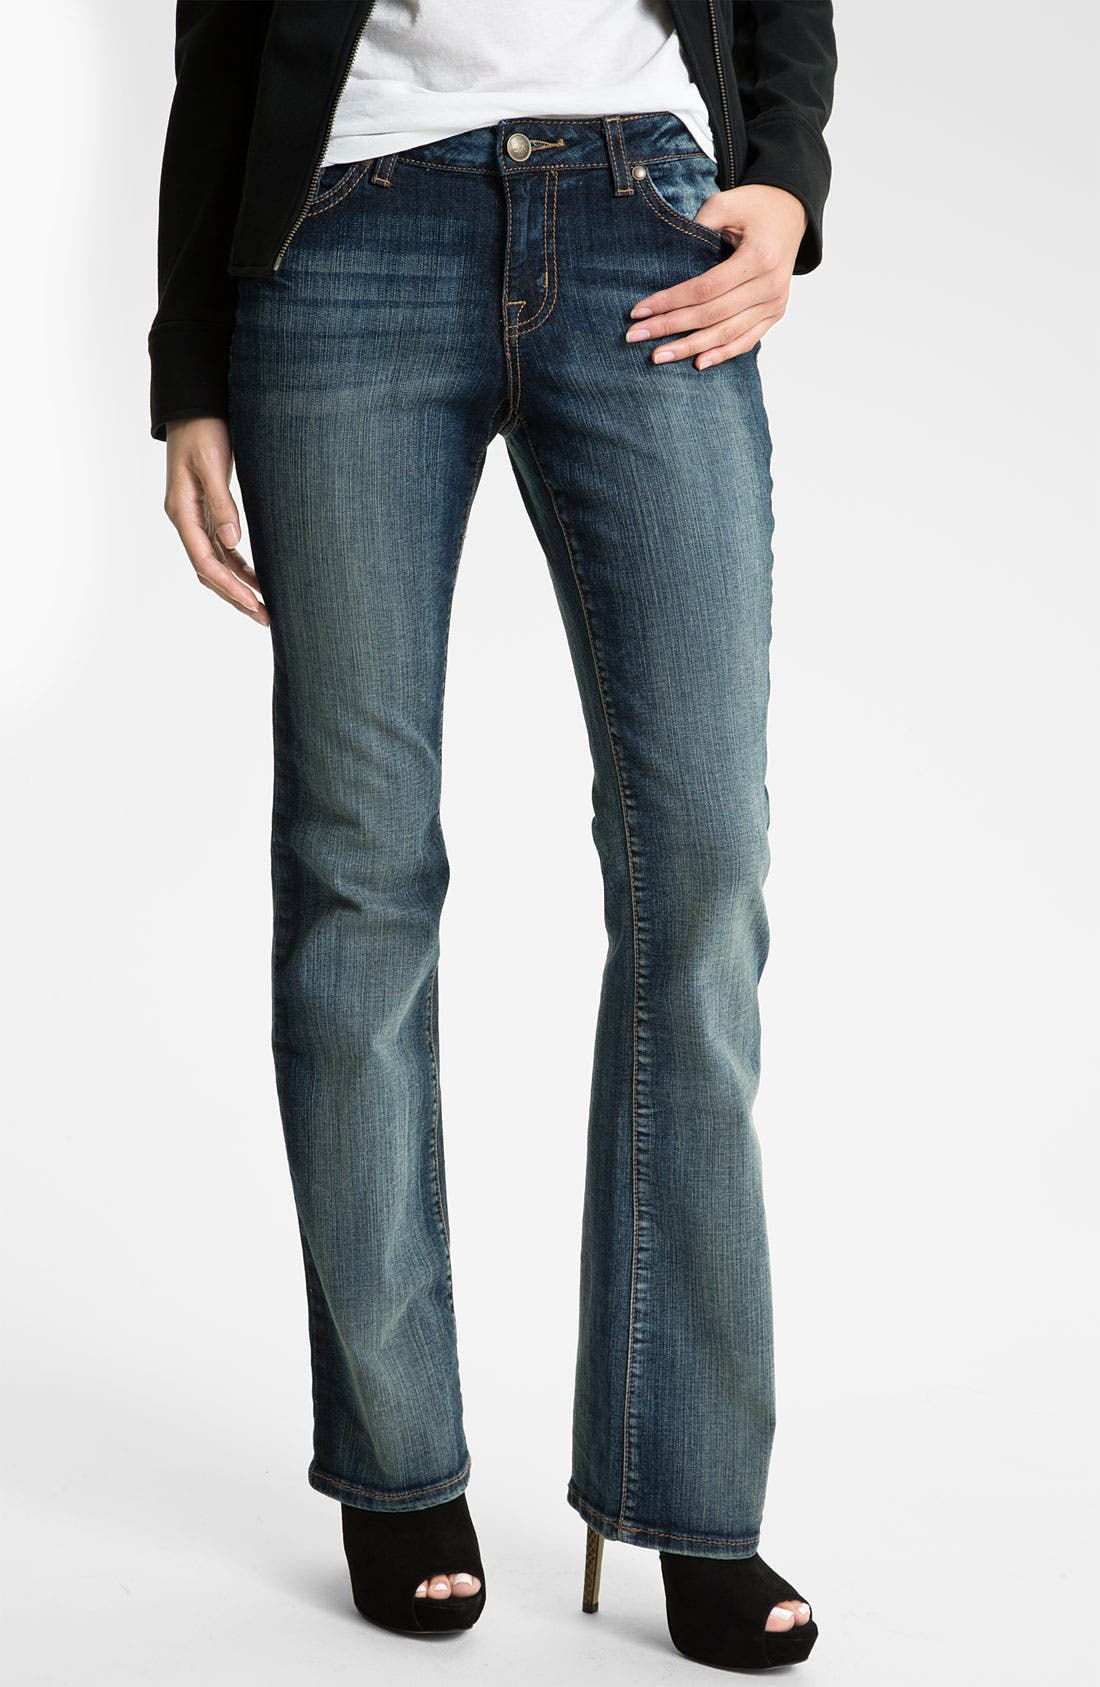 Main Image - Jessica Simpson 'Rockin' Curvy Bootcut Jeans (Blitzen) (Online Only)